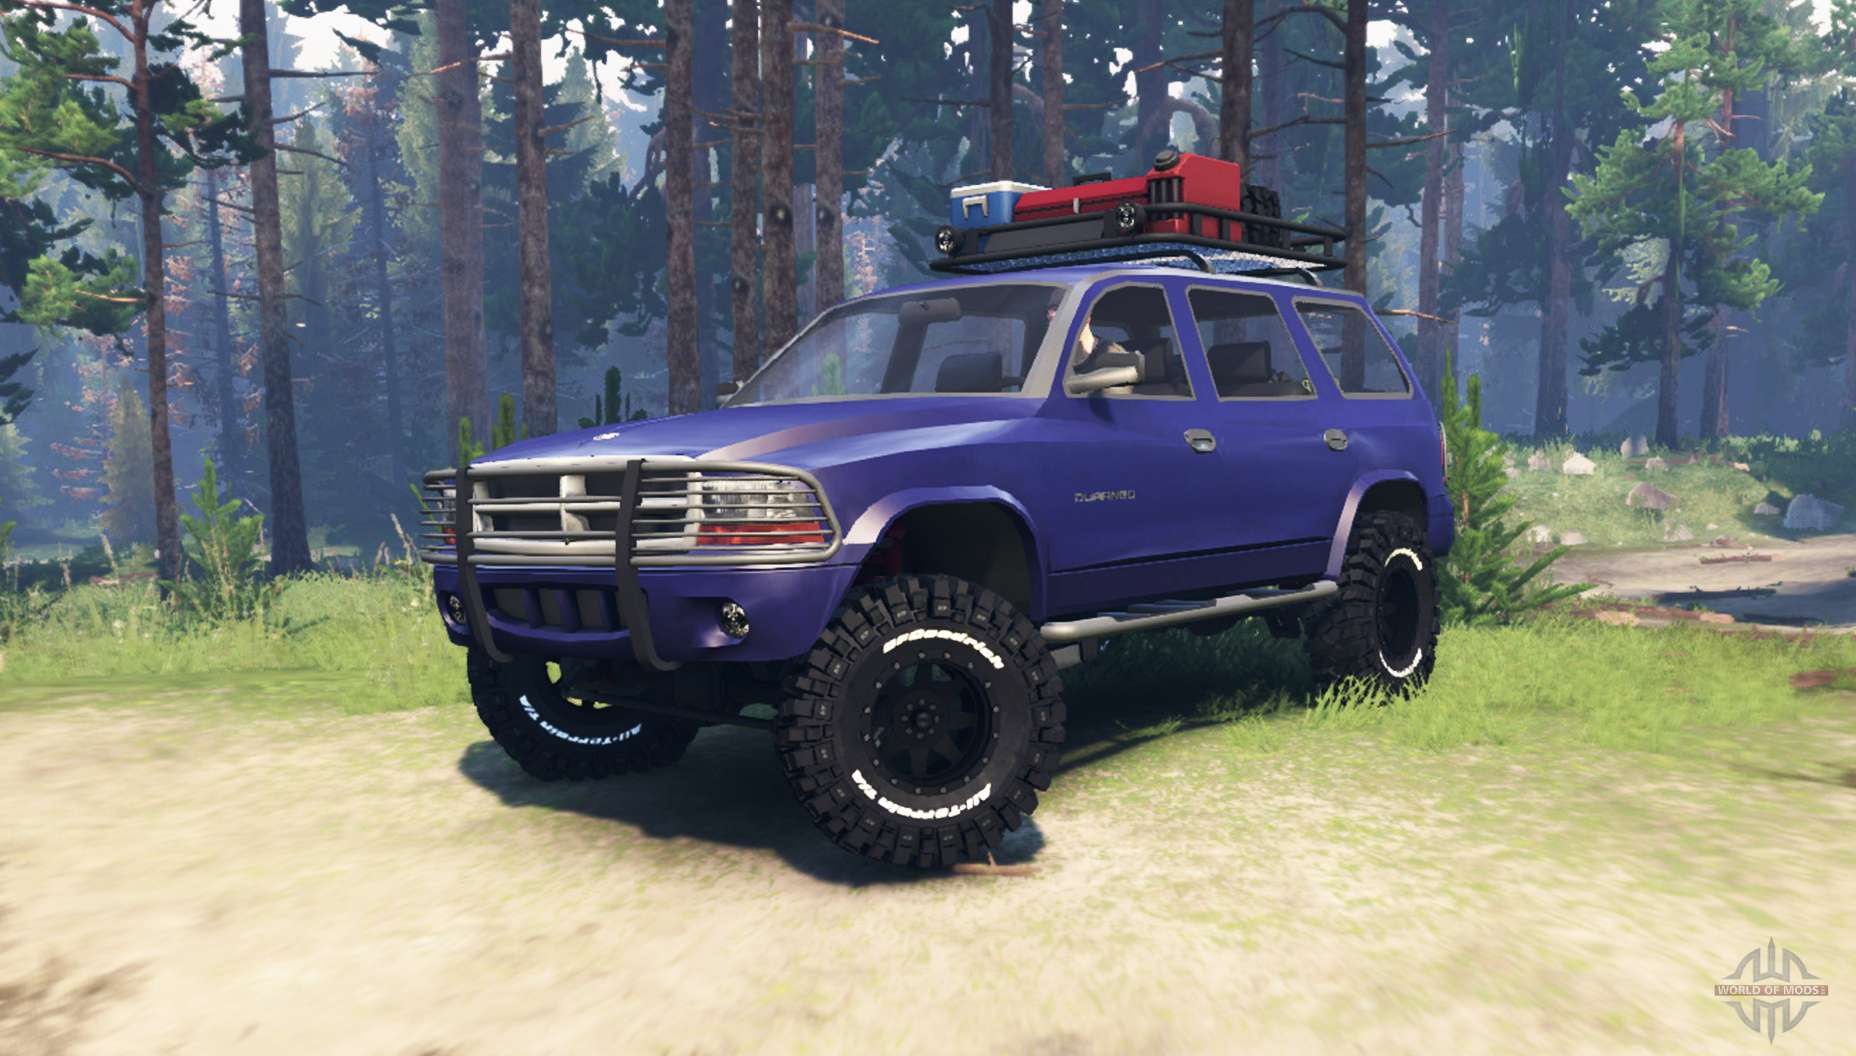 Spintires on 05 Dodge Durango Parts